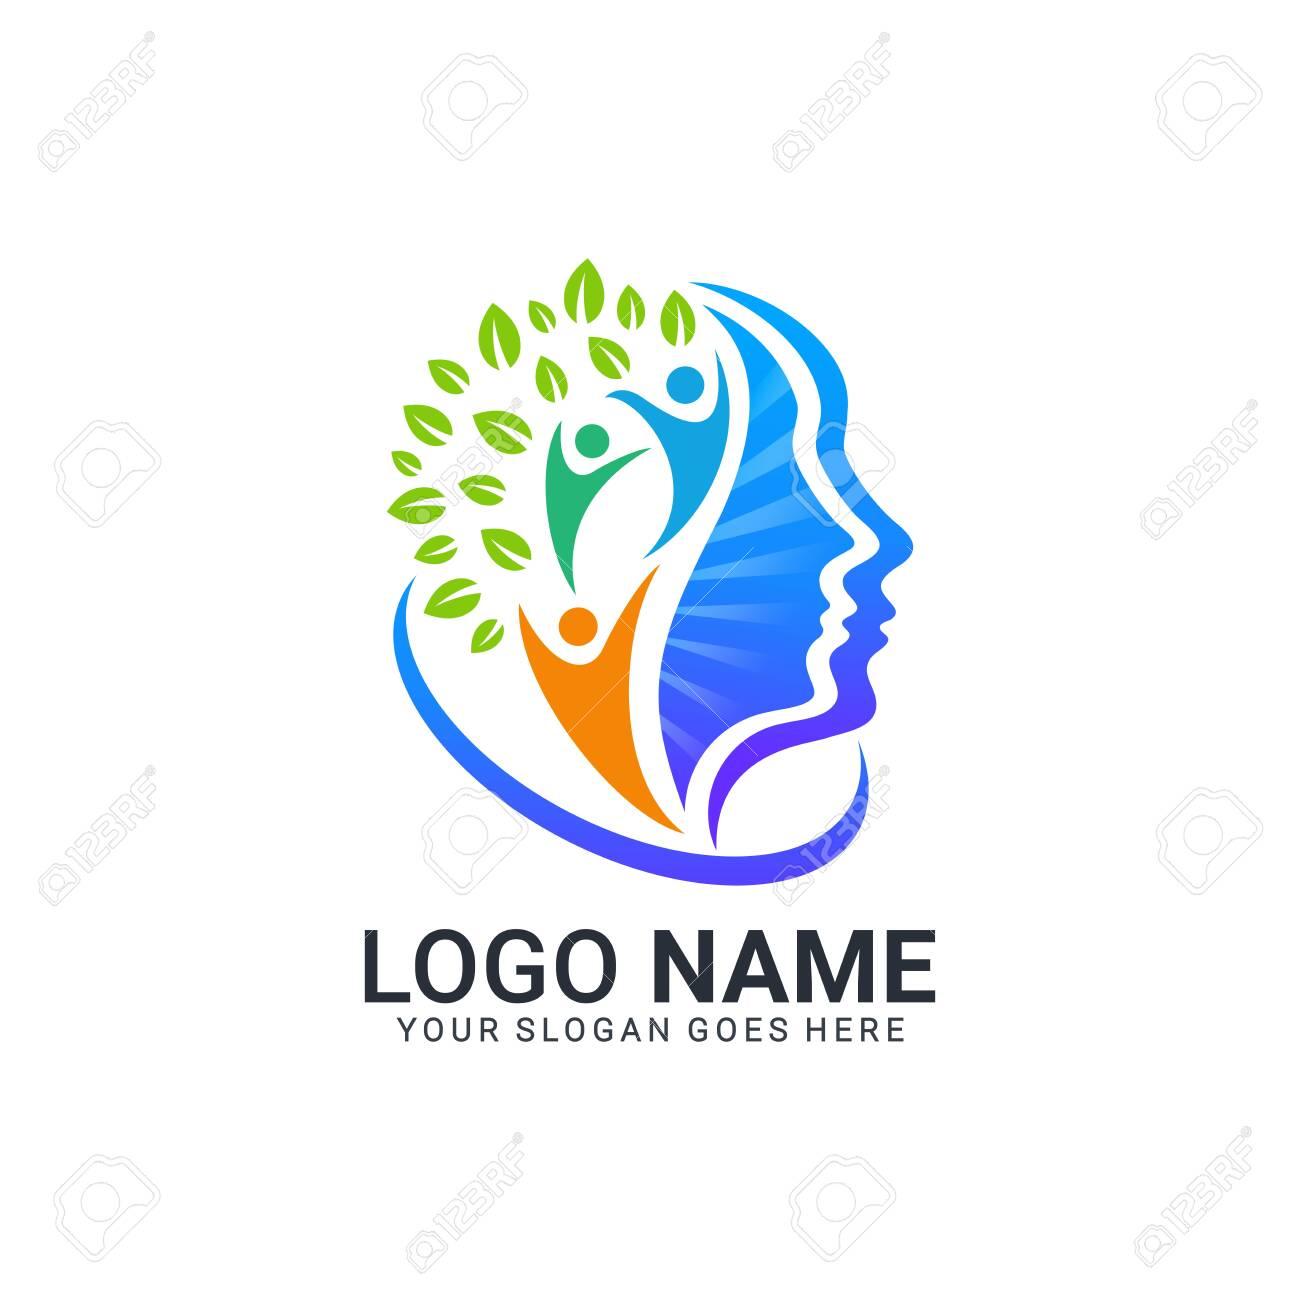 Abstract digital technology symbol logo design.Modern dditable logo design - 130991900